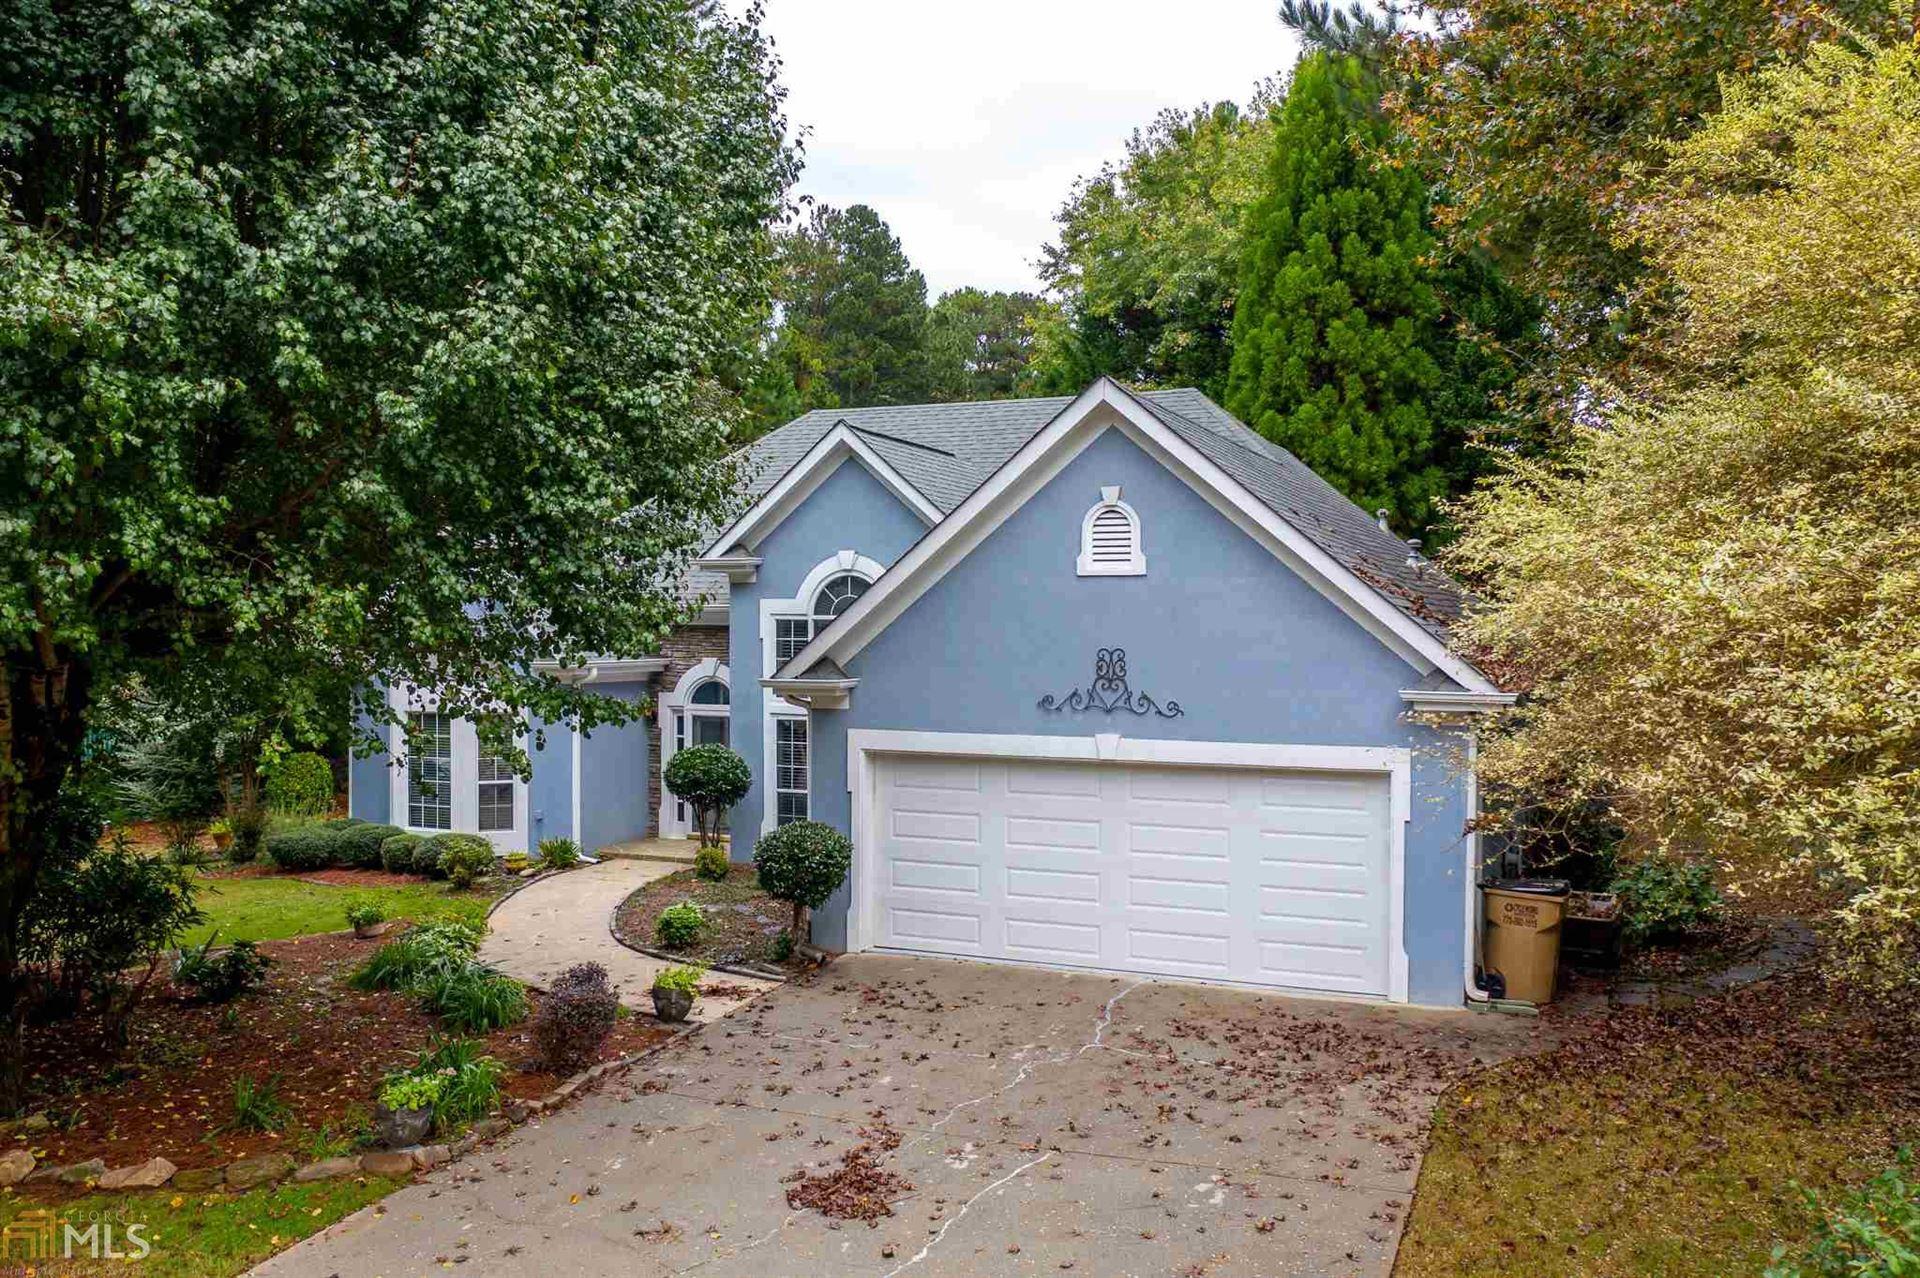 102 Regency Chase, Acworth, GA 30102 - MLS#: 8873369